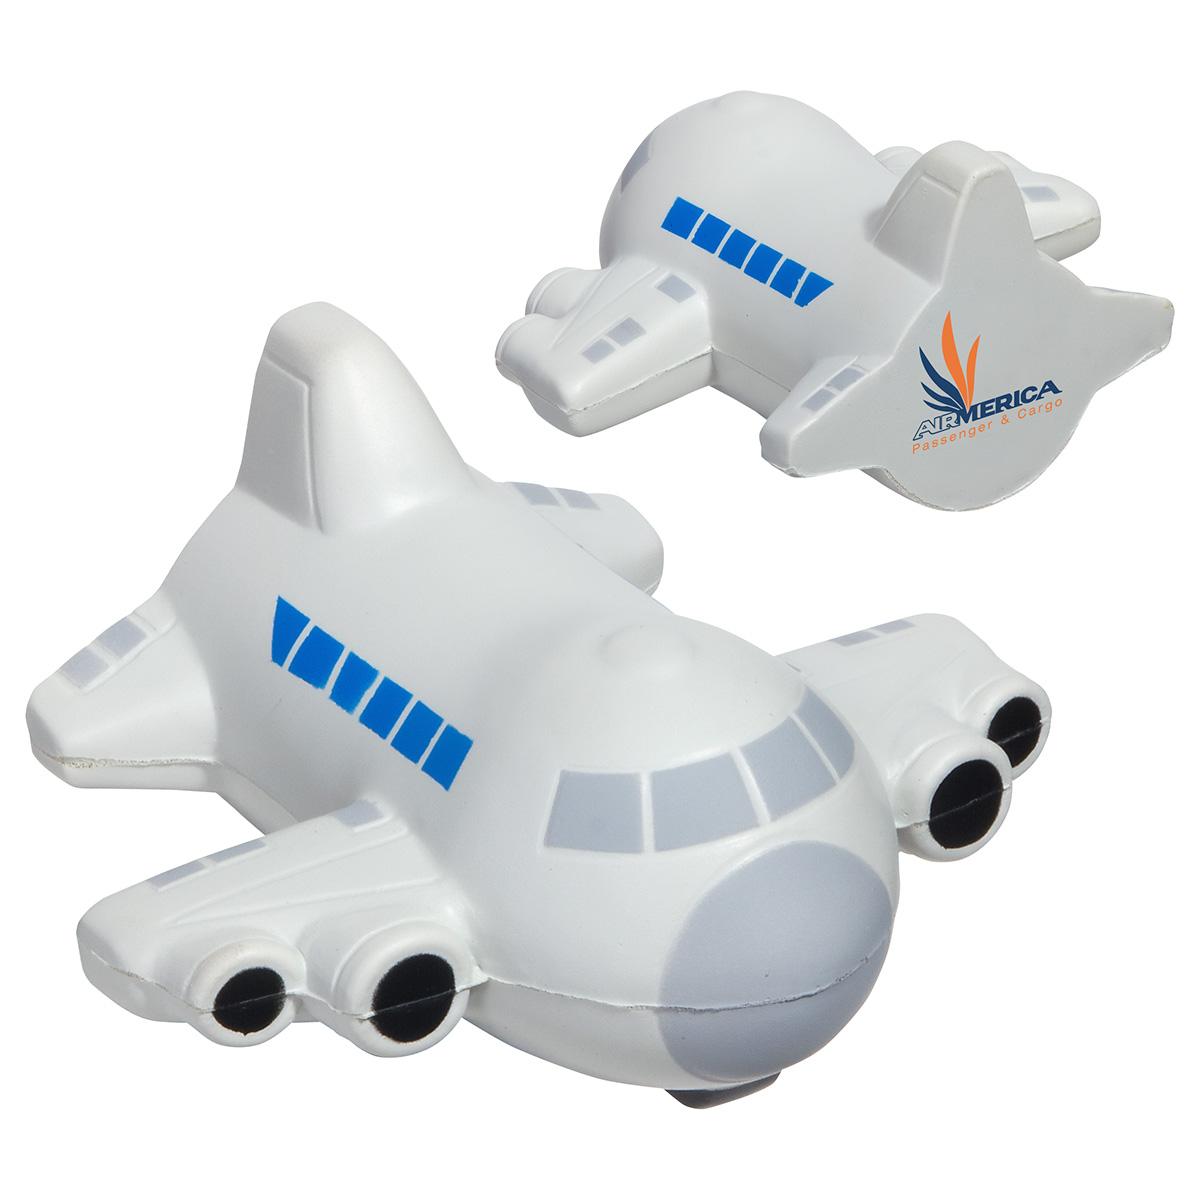 Small Airplane Stress Reliever, LAR-SA03 - 1 Colour Imprint